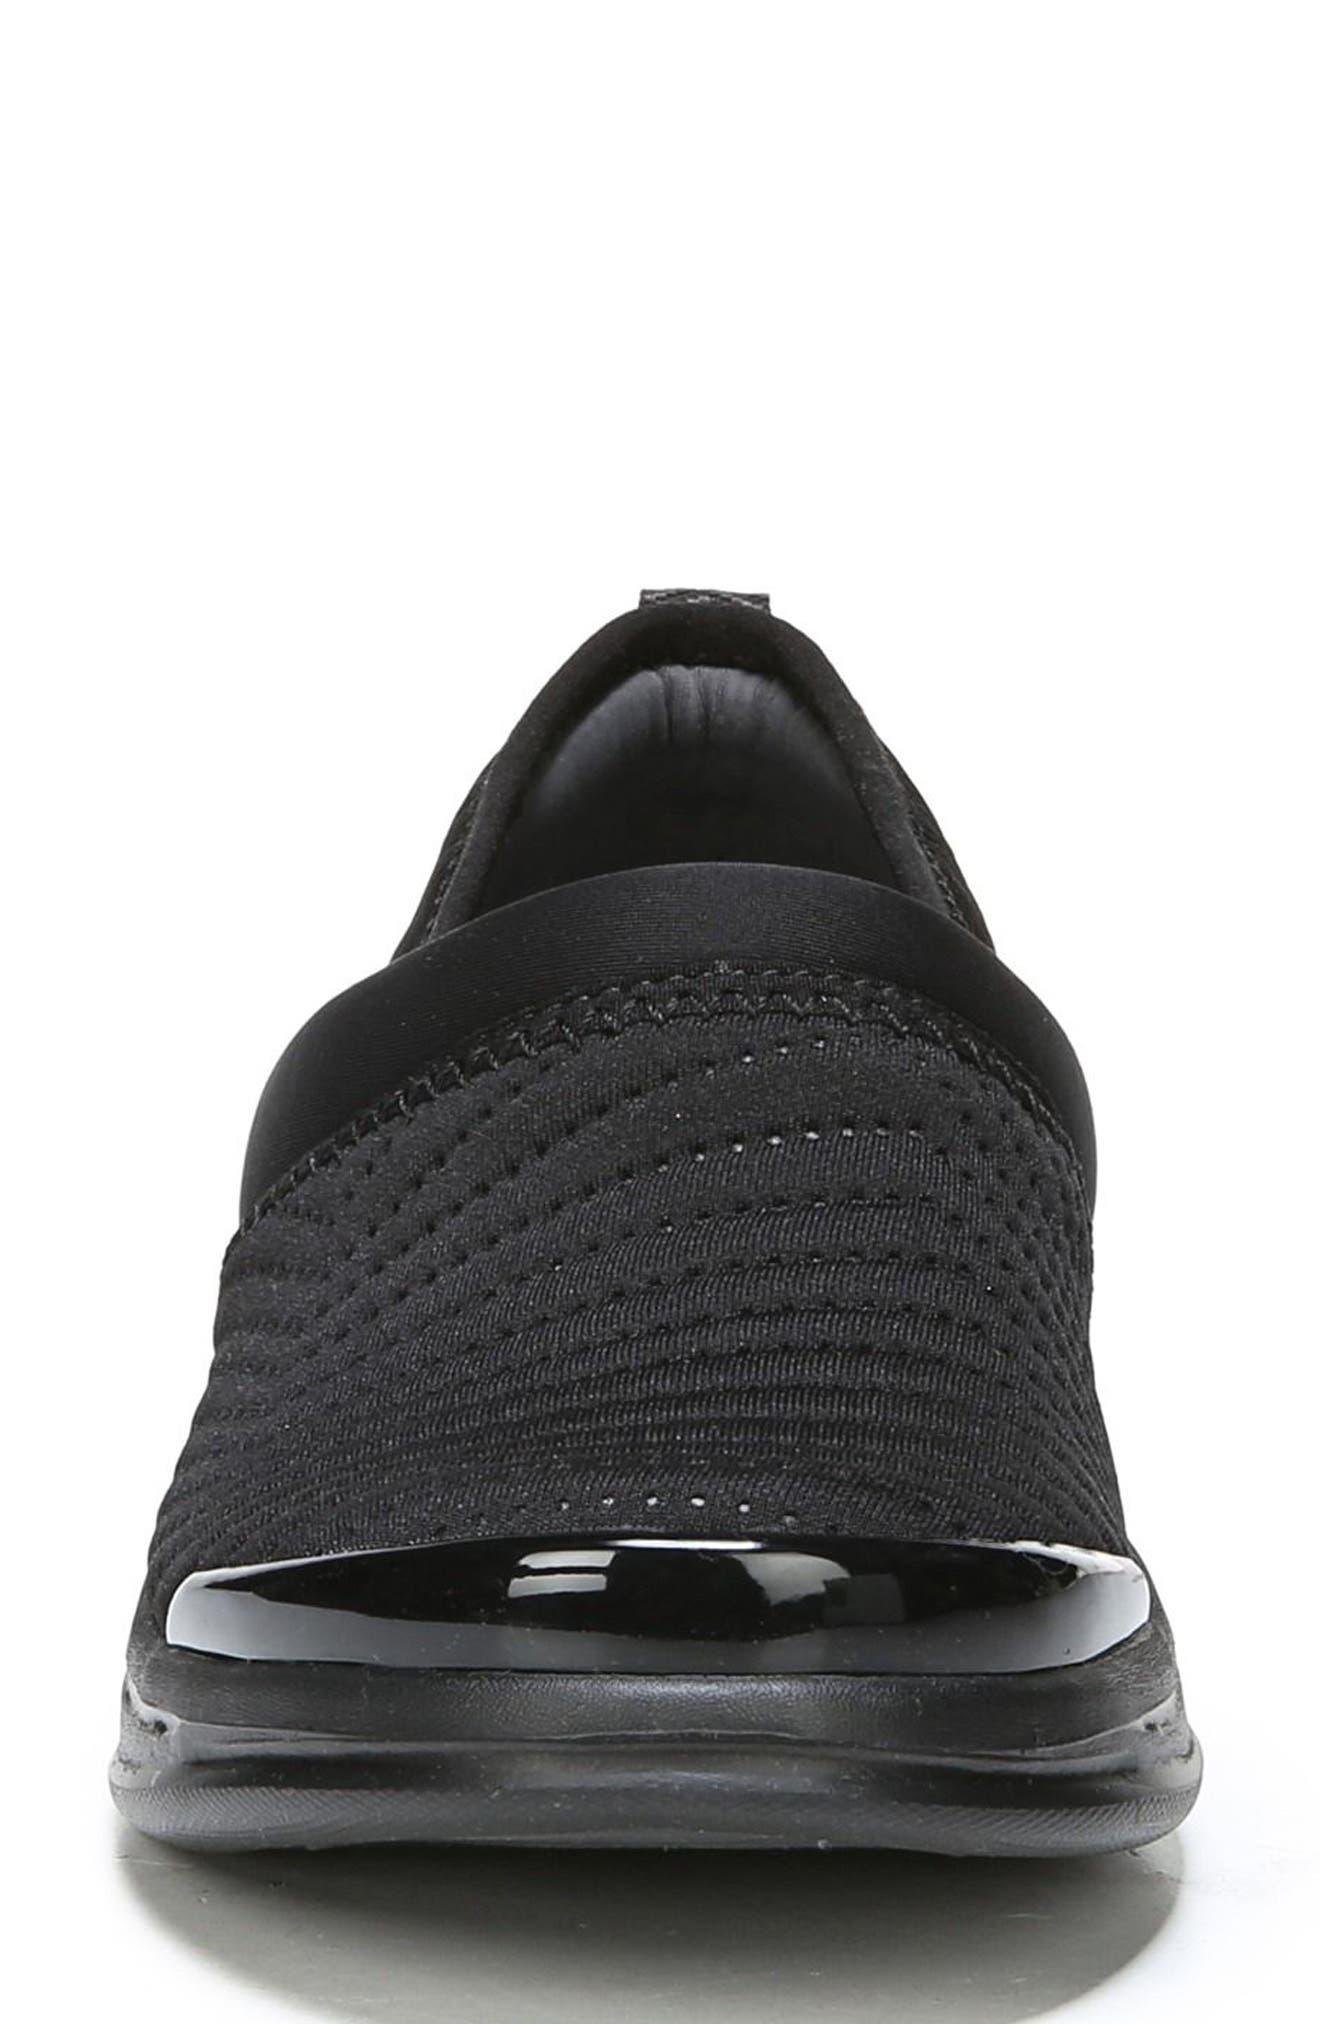 Coco Slip-On Sneaker,                             Alternate thumbnail 4, color,                             BLACK FABRIC